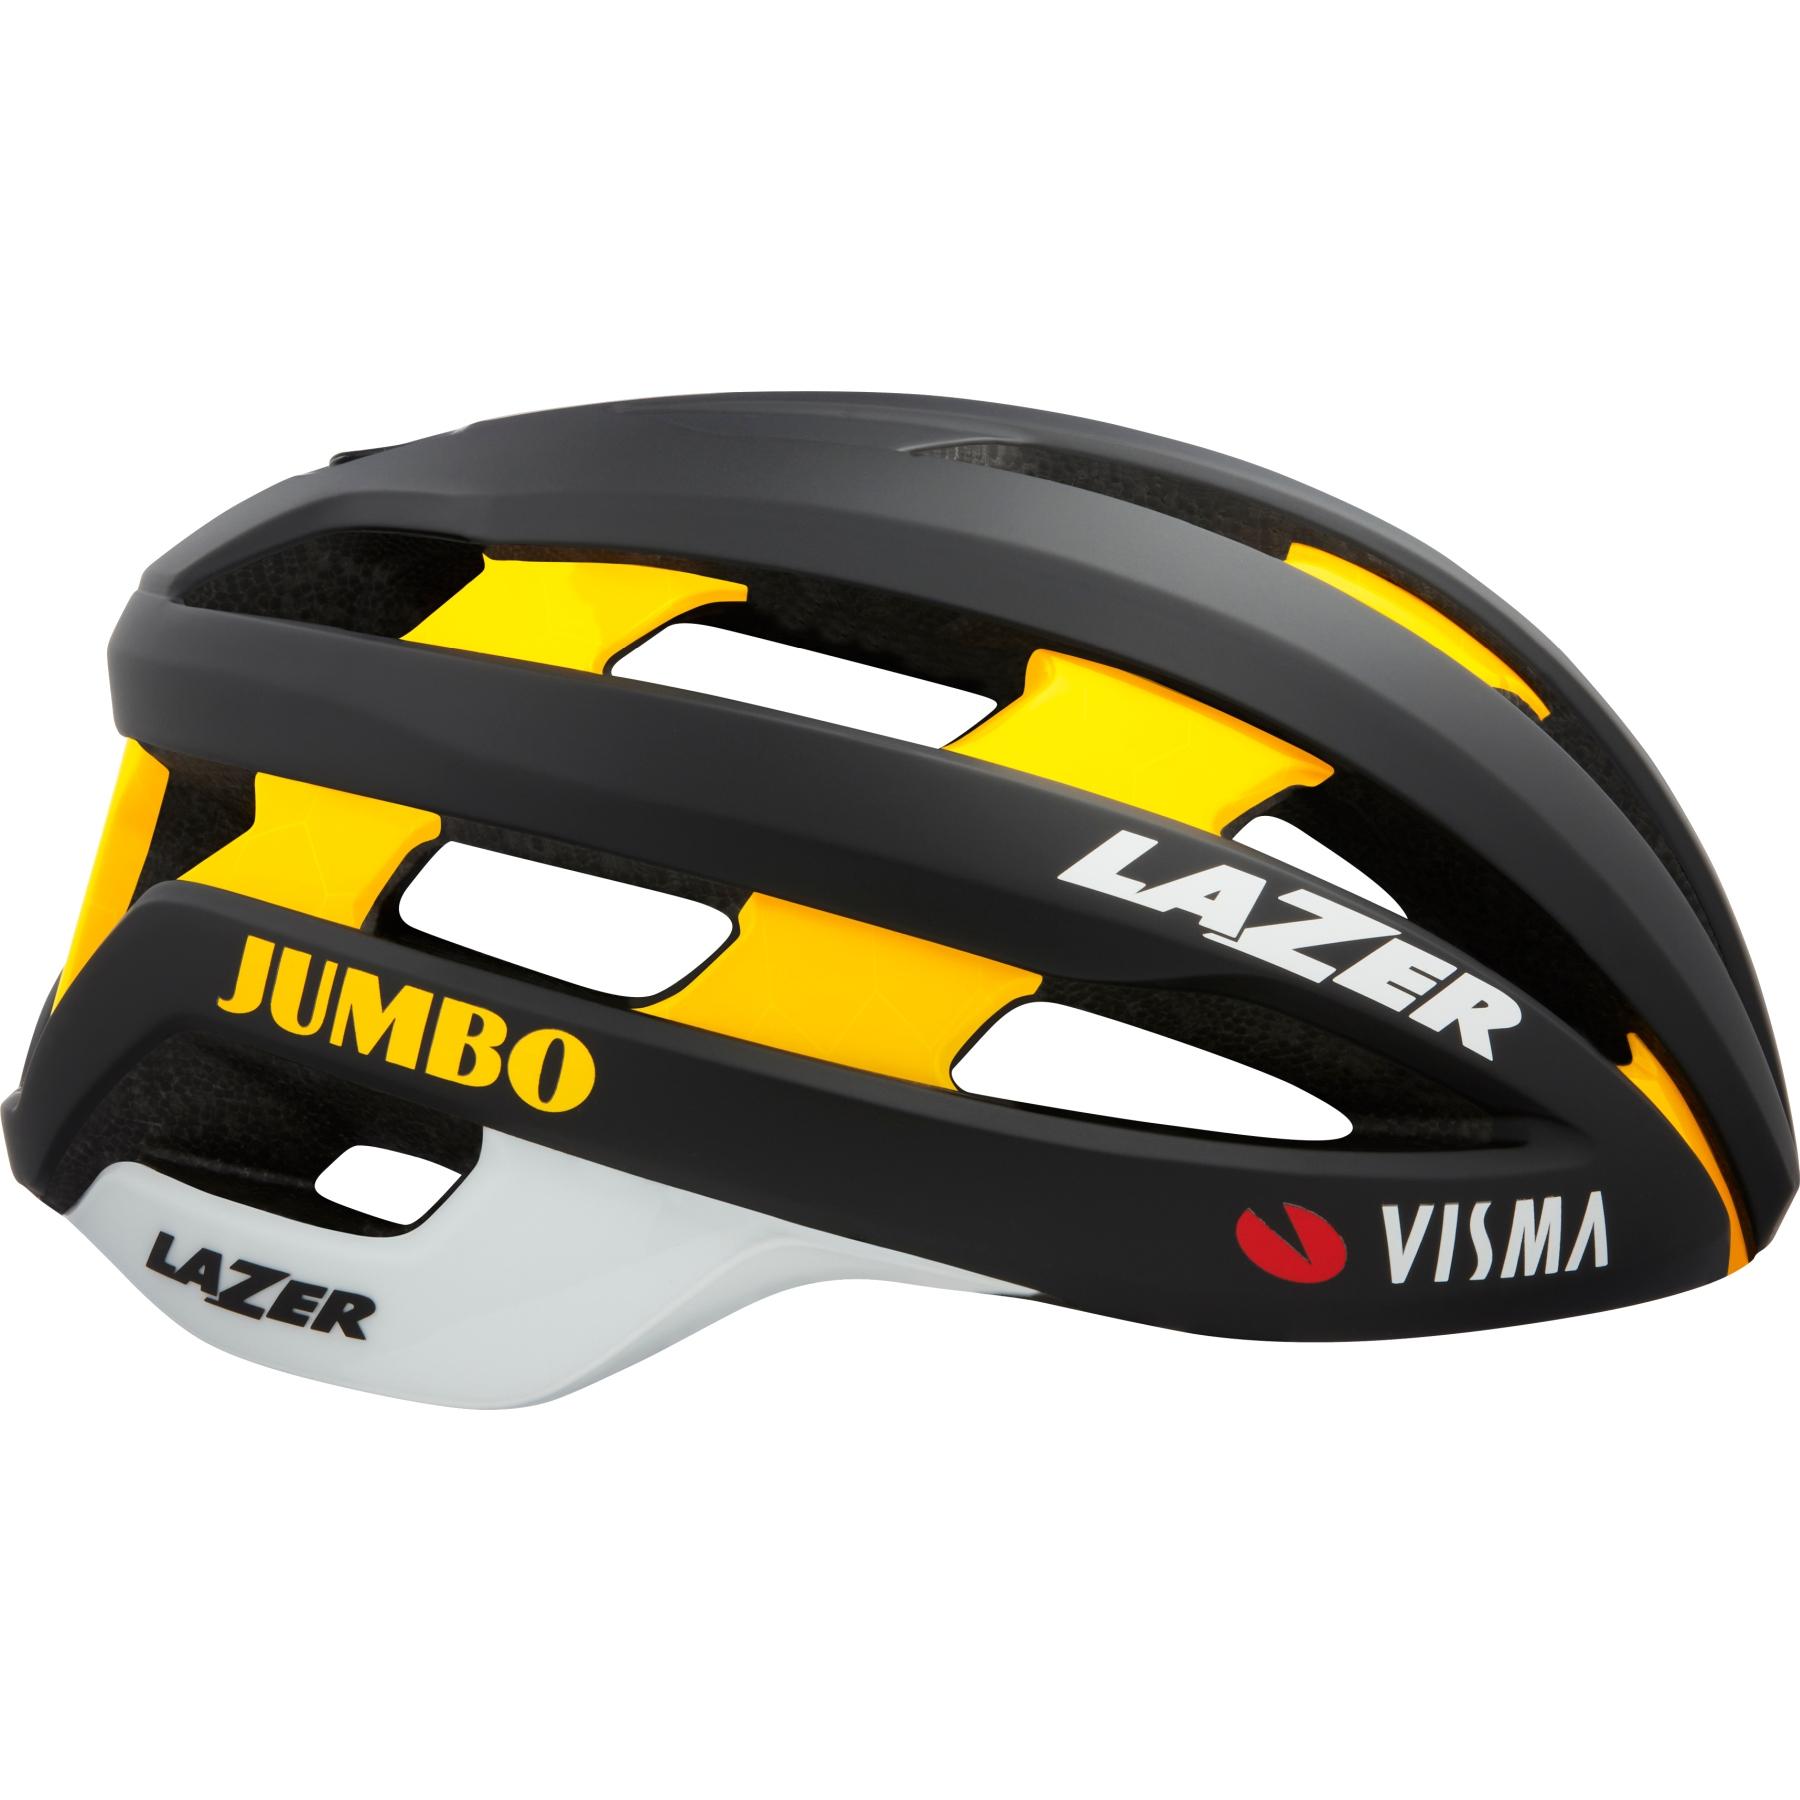 Lazer Sphere Helm Team Jumbo-Visma - black/yellow